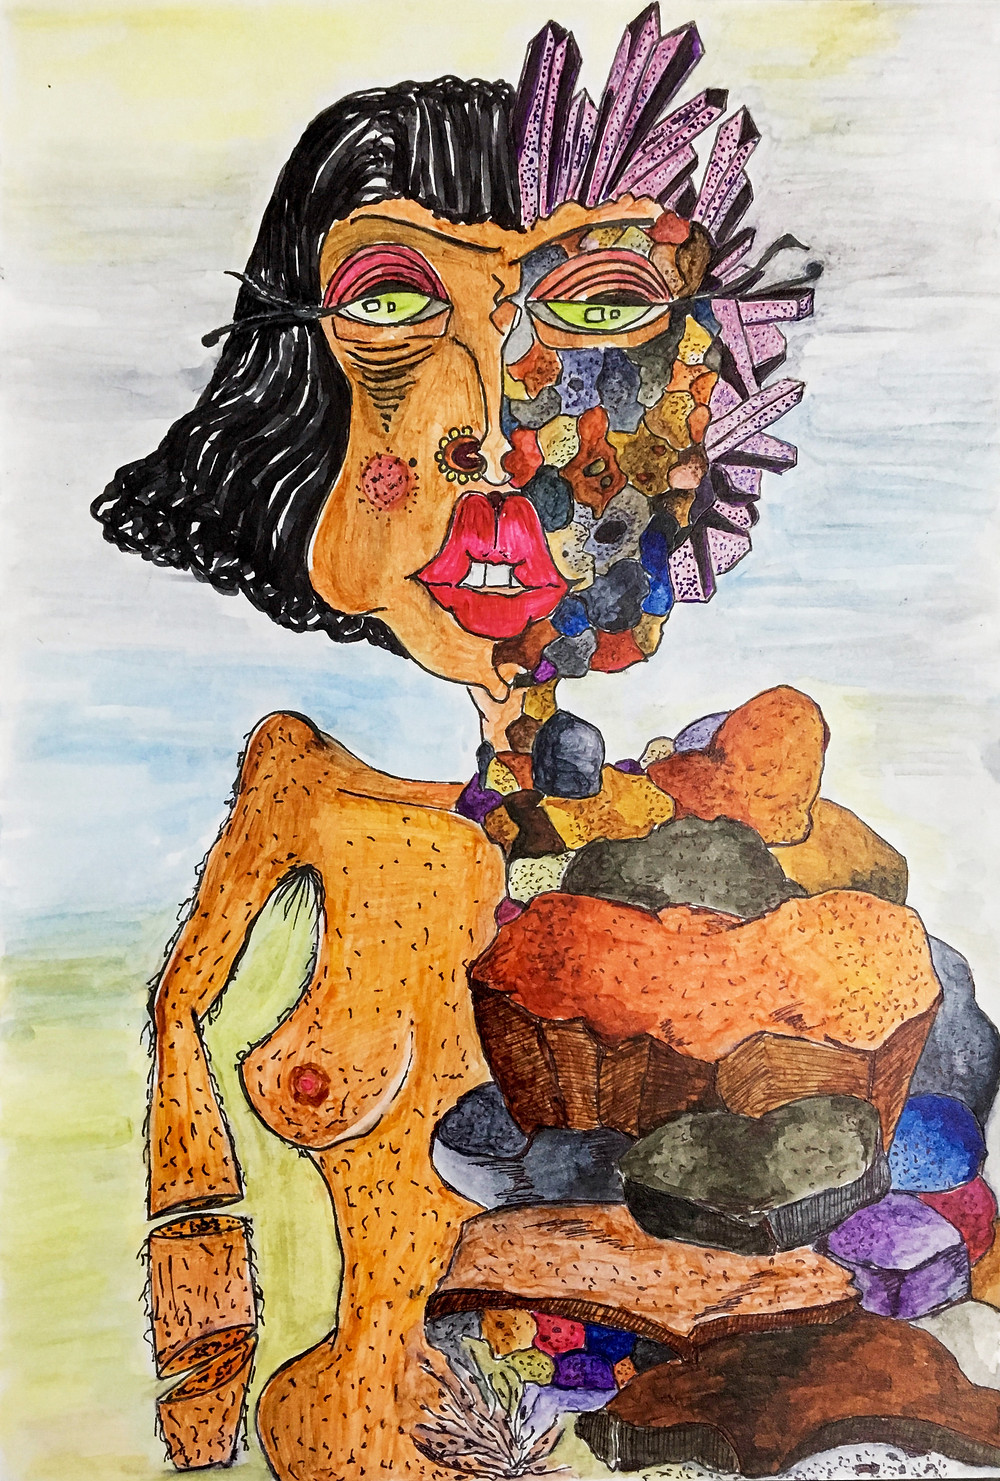 fashion designer and artist Pratiksha Tandon's artwork of a woman struggling